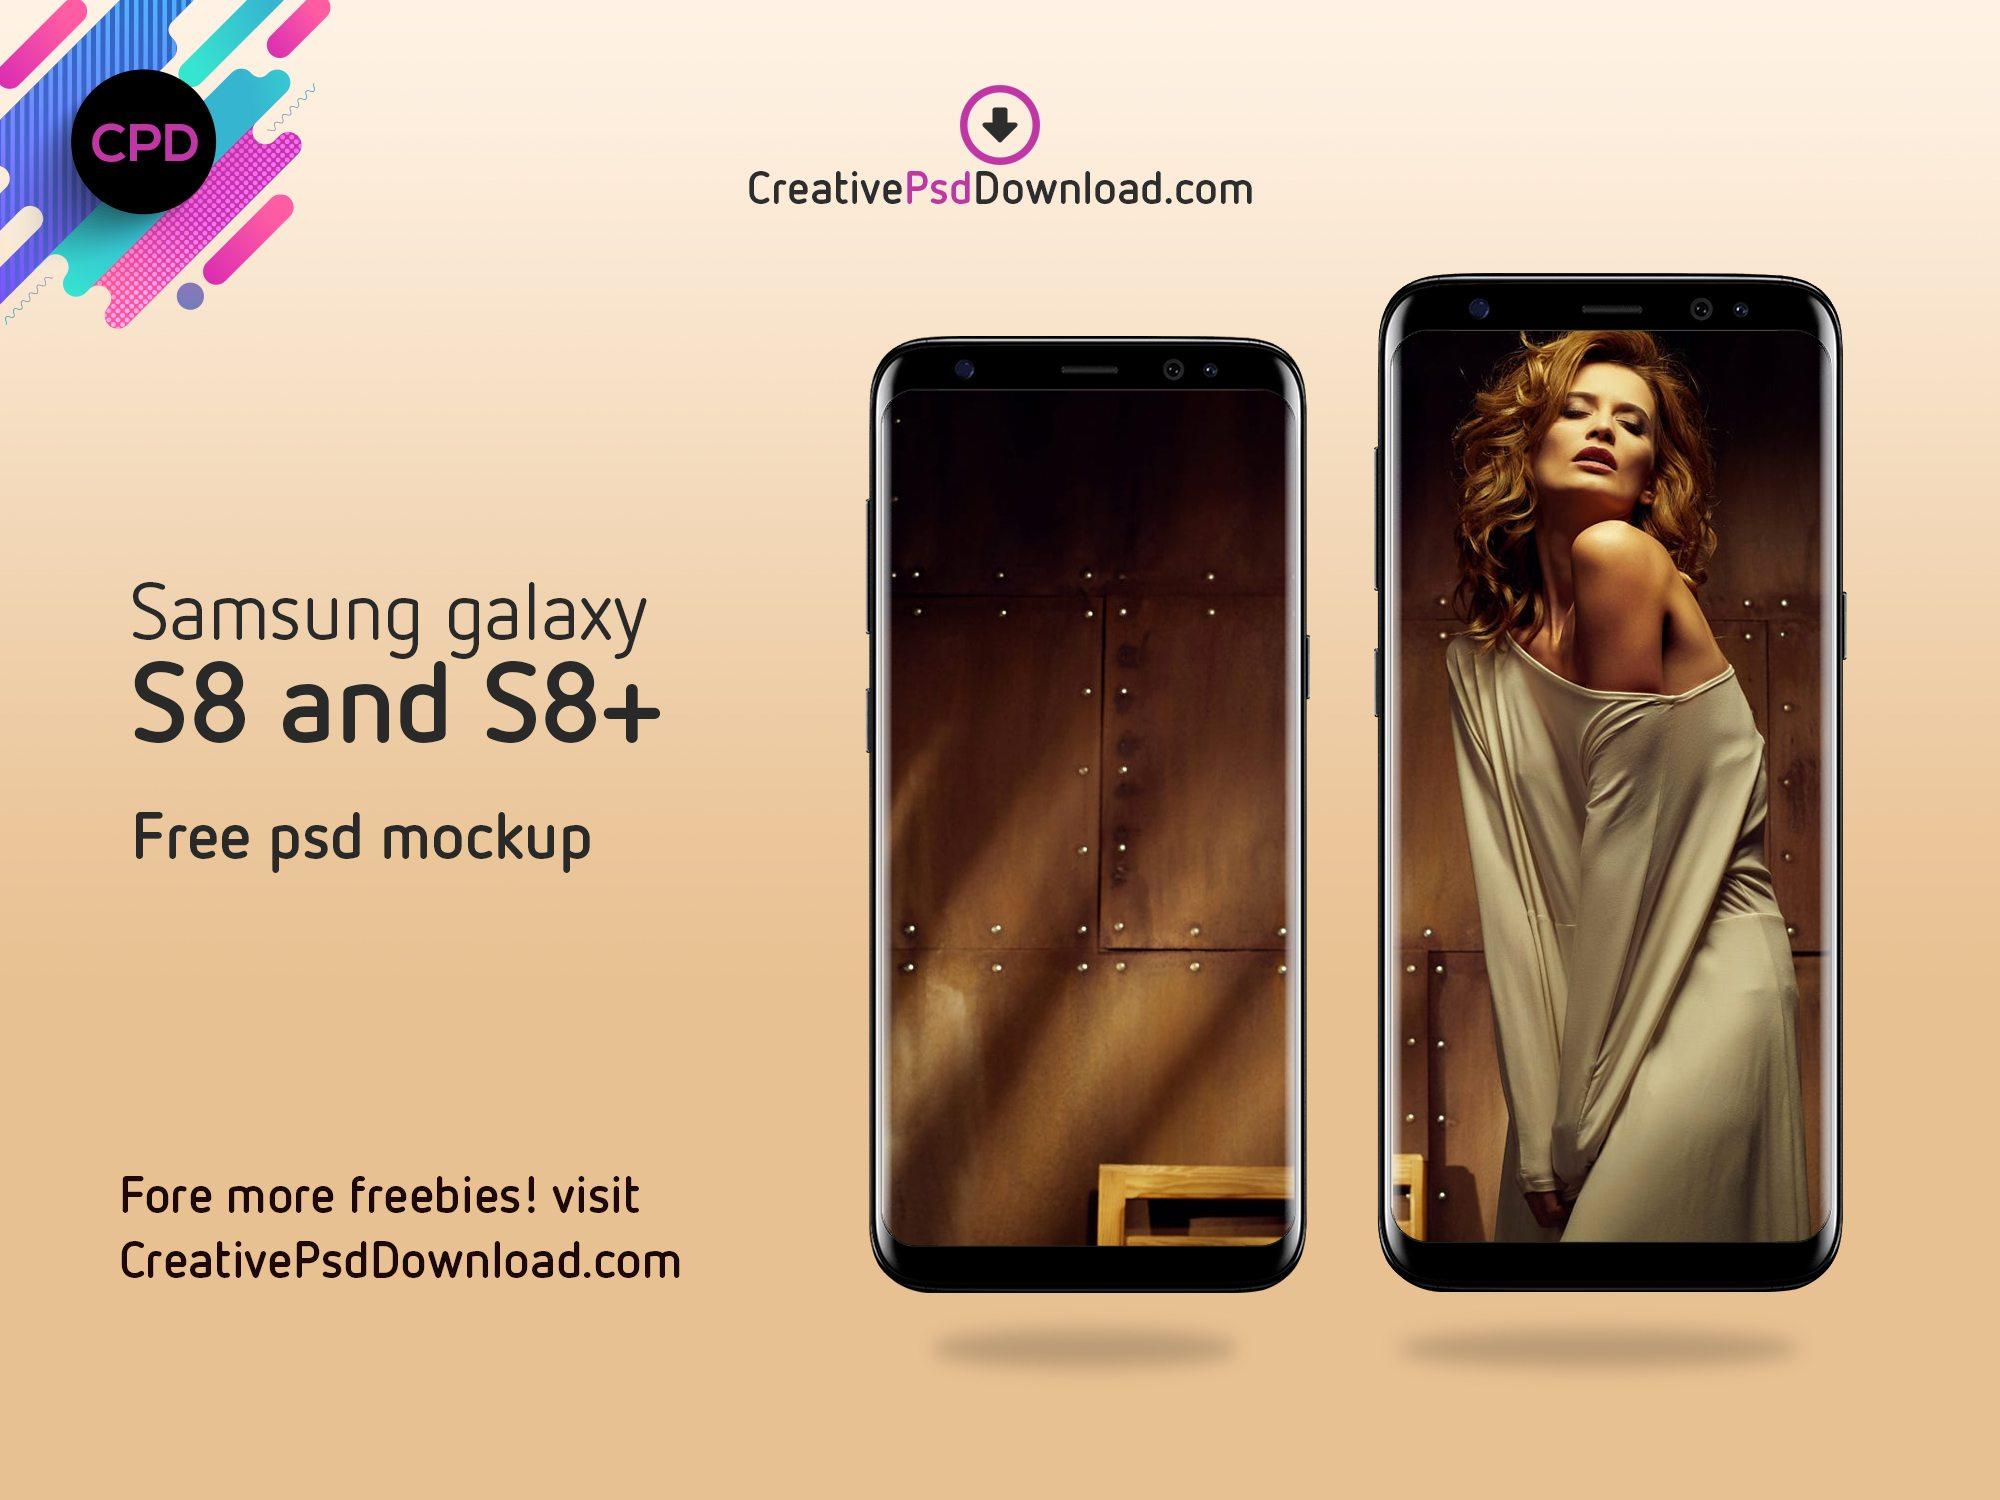 Samsung Galaxy S8 And S8+ Free Psd Mockup